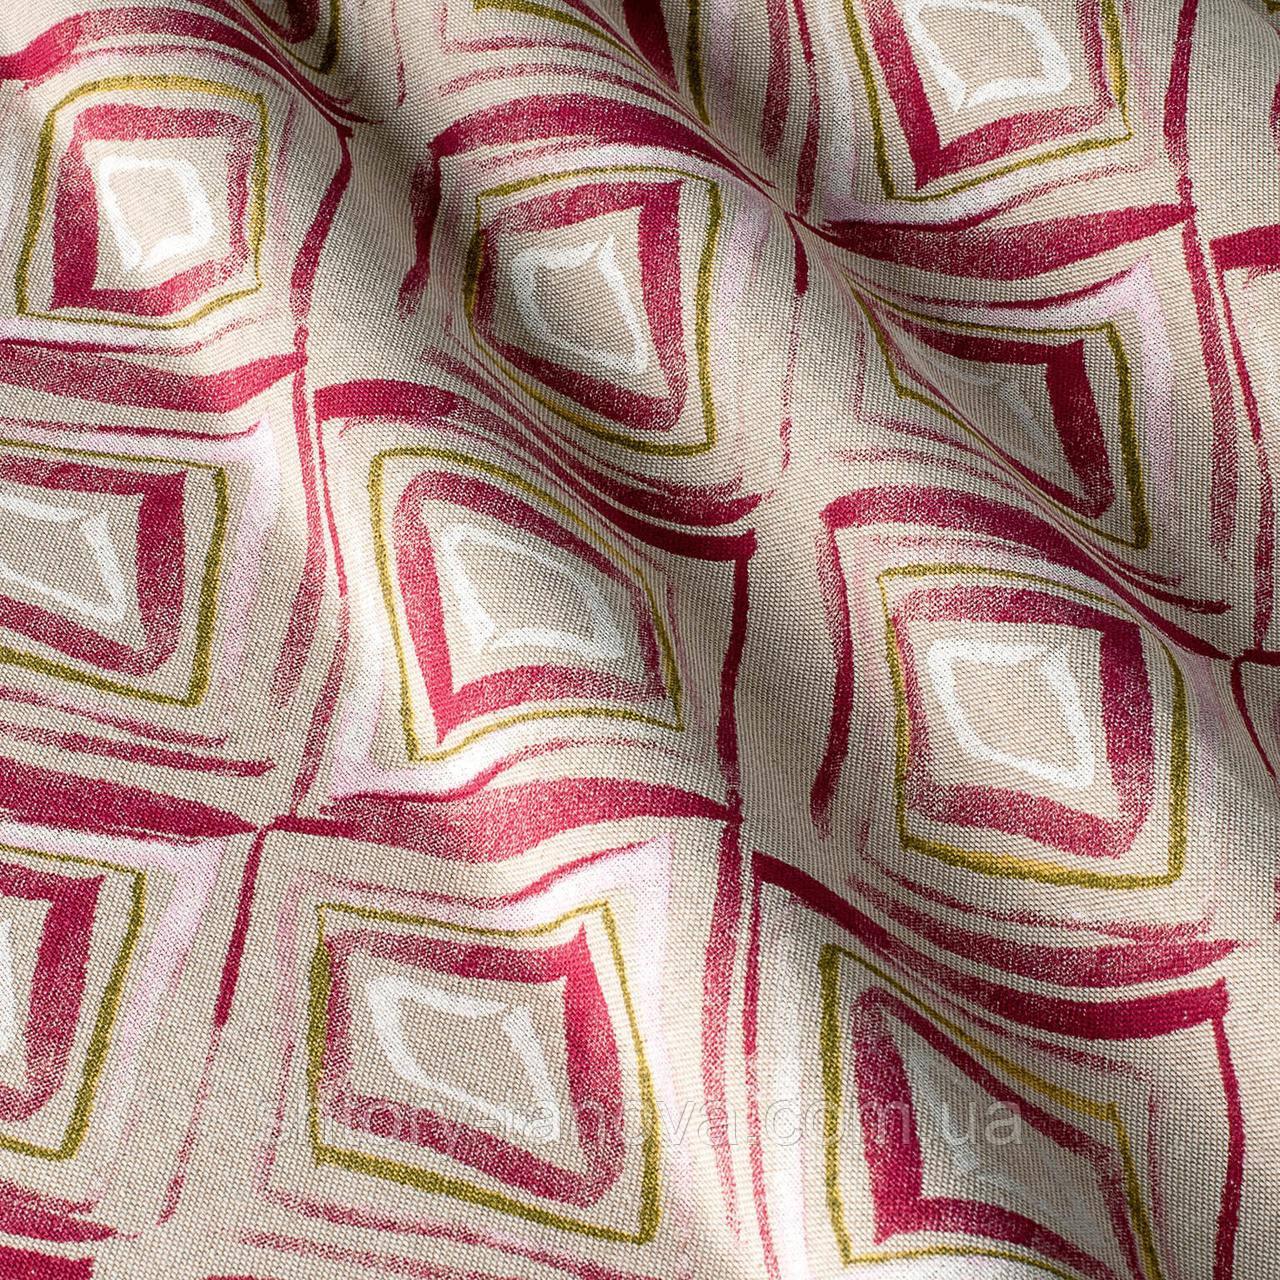 Декоративная ткань с геометрическим принтом, ромбик